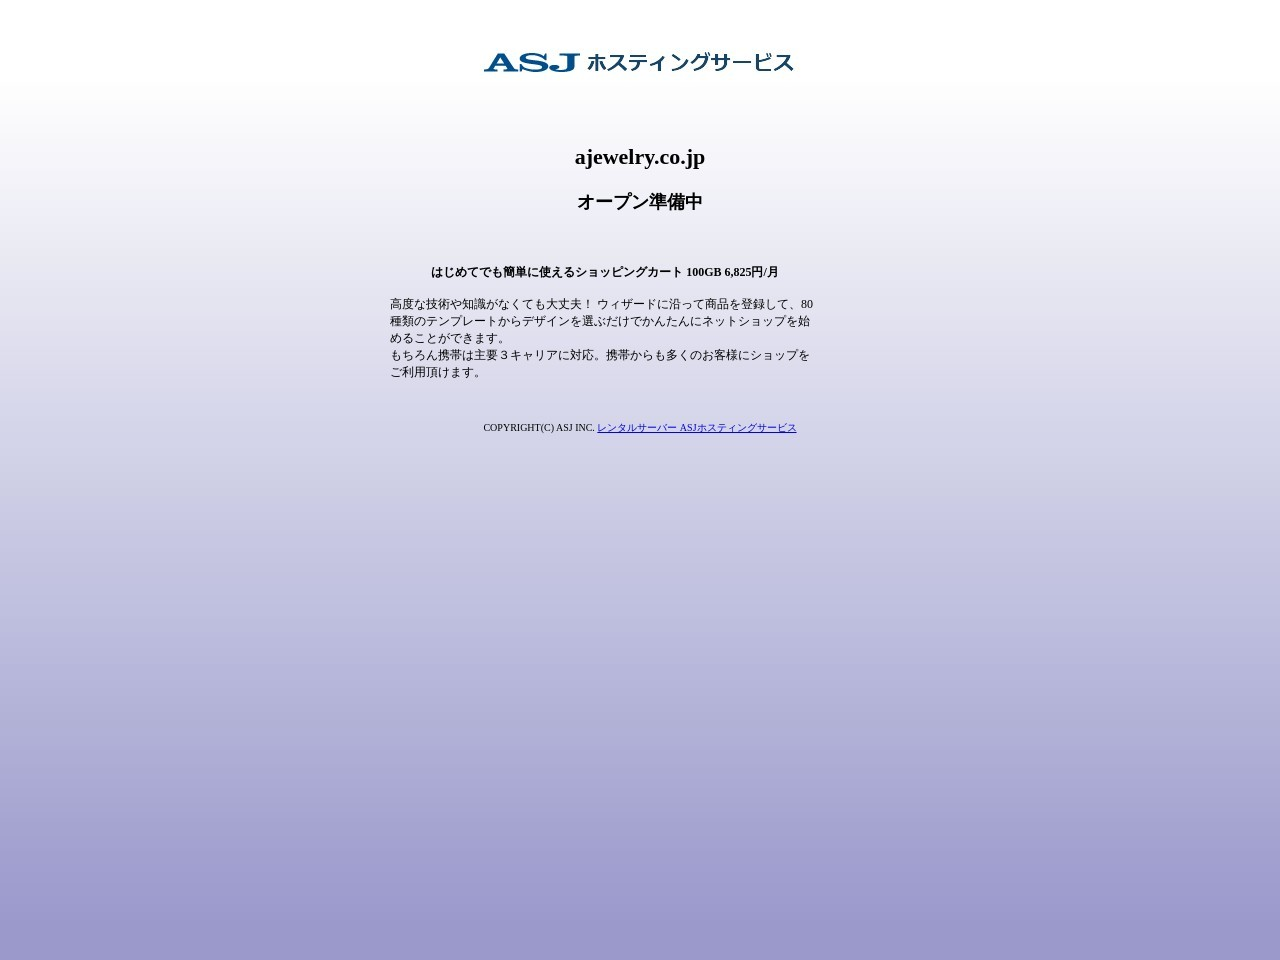 ajewelry.co.jp